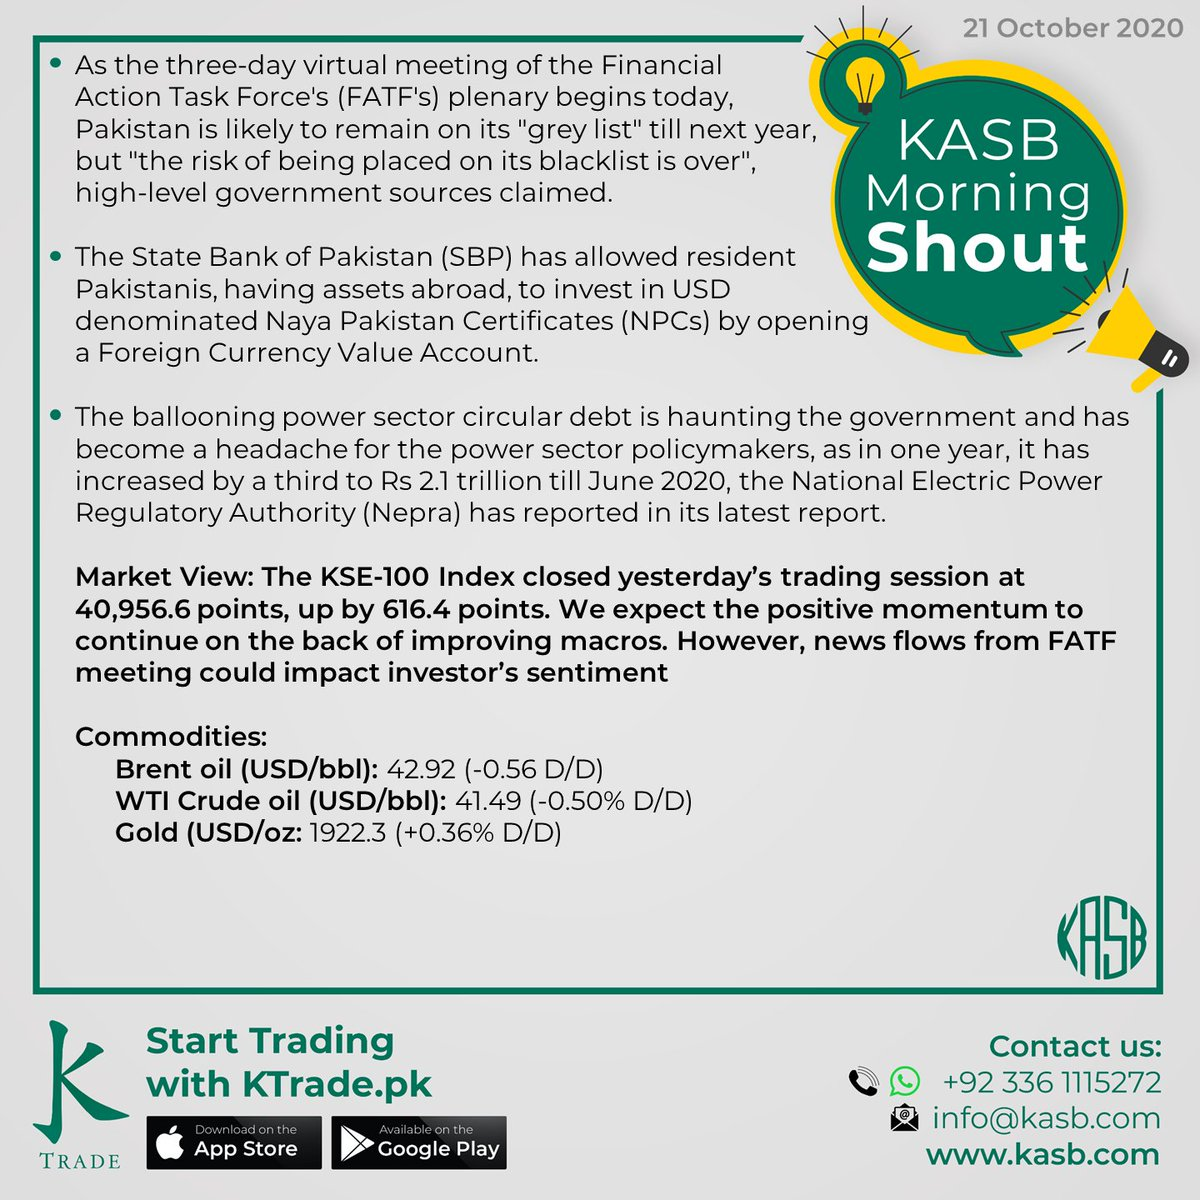 KASB Morning Shout: Our views on today's news #kasb #smartinvesting #psx #stockmarket #KTrade #onlinetrading #pakistaneconomy #imrankhan #sbp #inflation #kse100 #brokeragehouse #psxstocks #marketupdate #emergingmarkets #frontiermarkets #news #morning #today #views https://t.co/cBqlNr75Gu